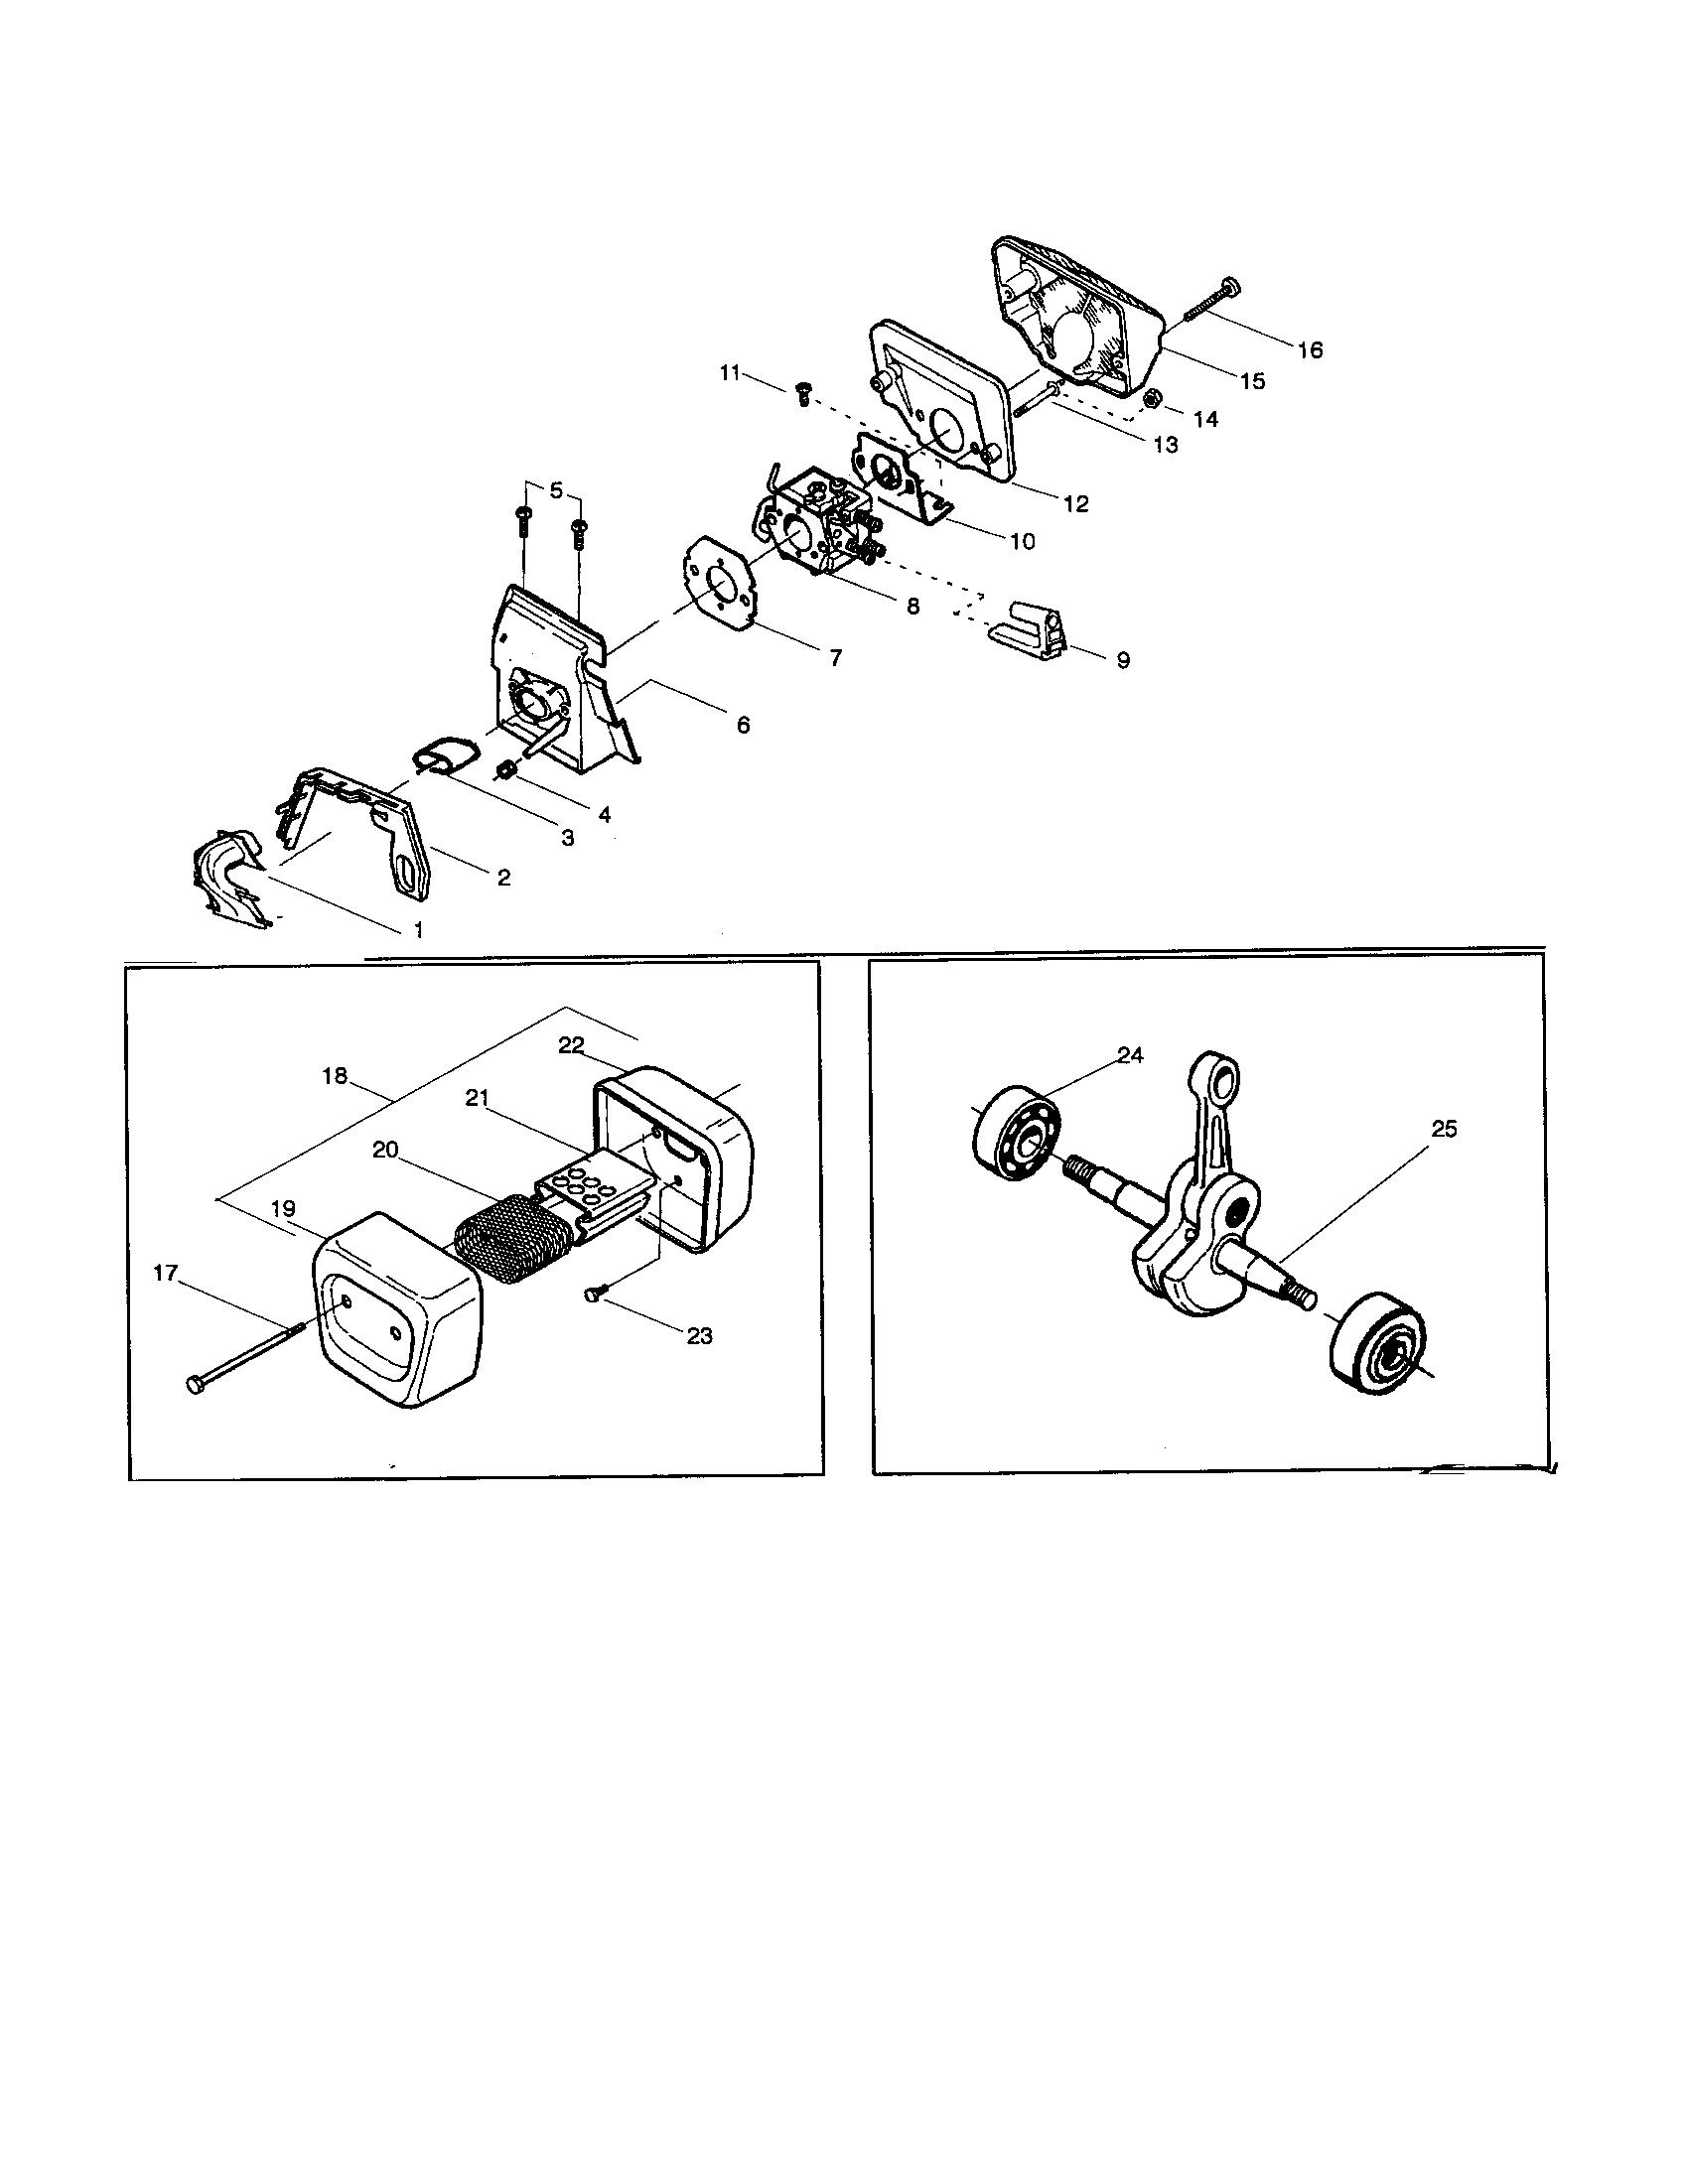 Husqvarna model 141 chainsaw, gas genuine parts